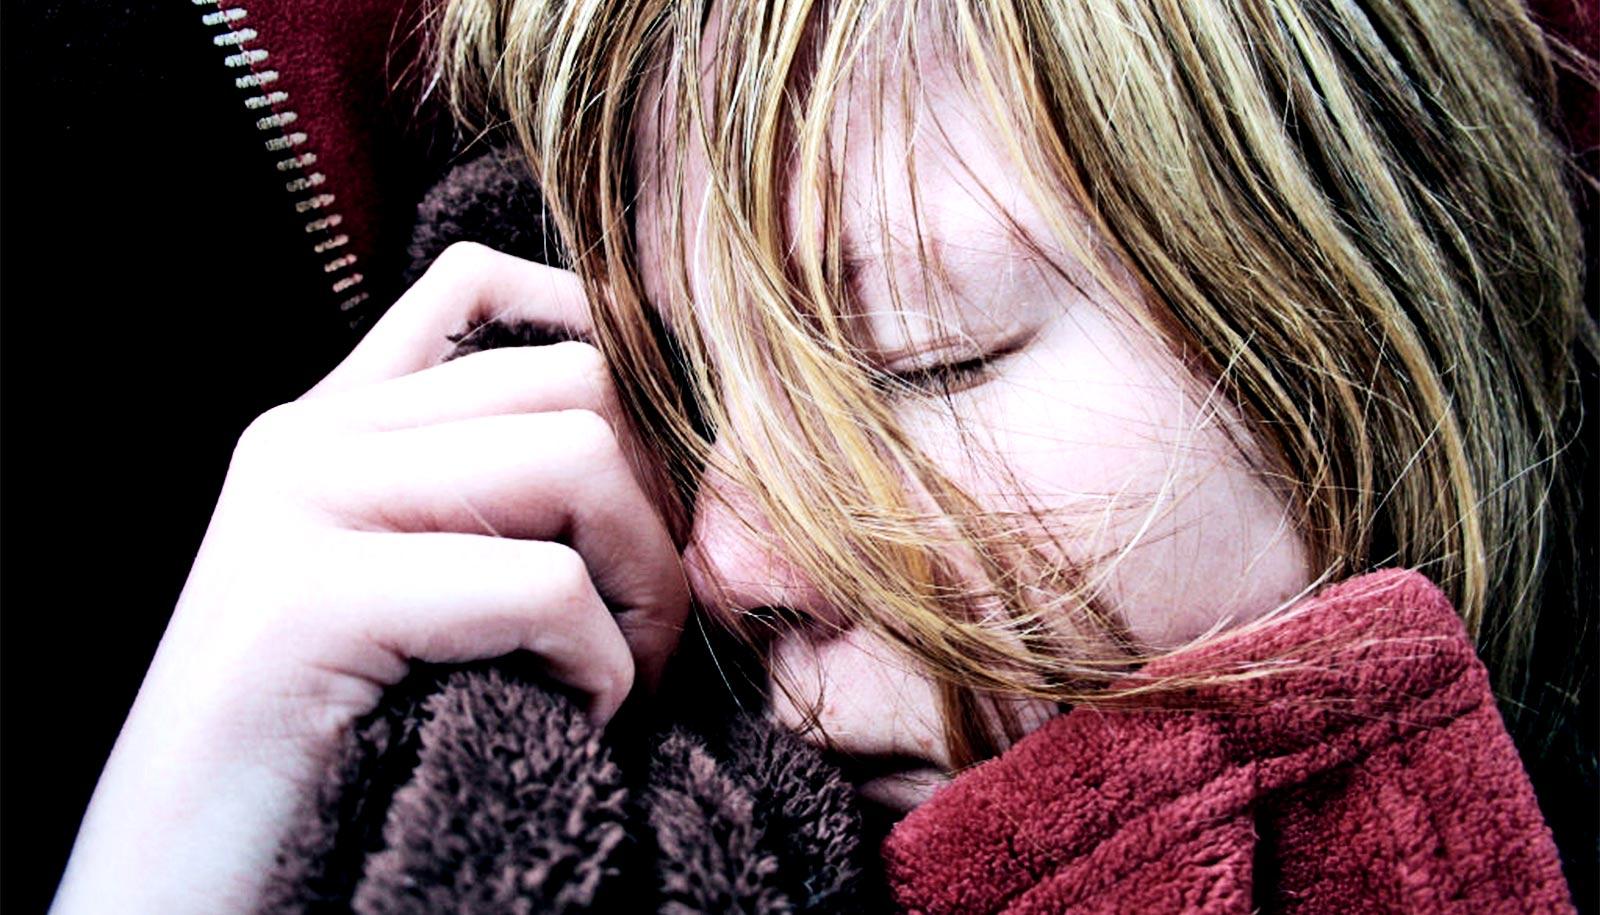 Mice poop shows gut bacteria is key to sleep - Futurity